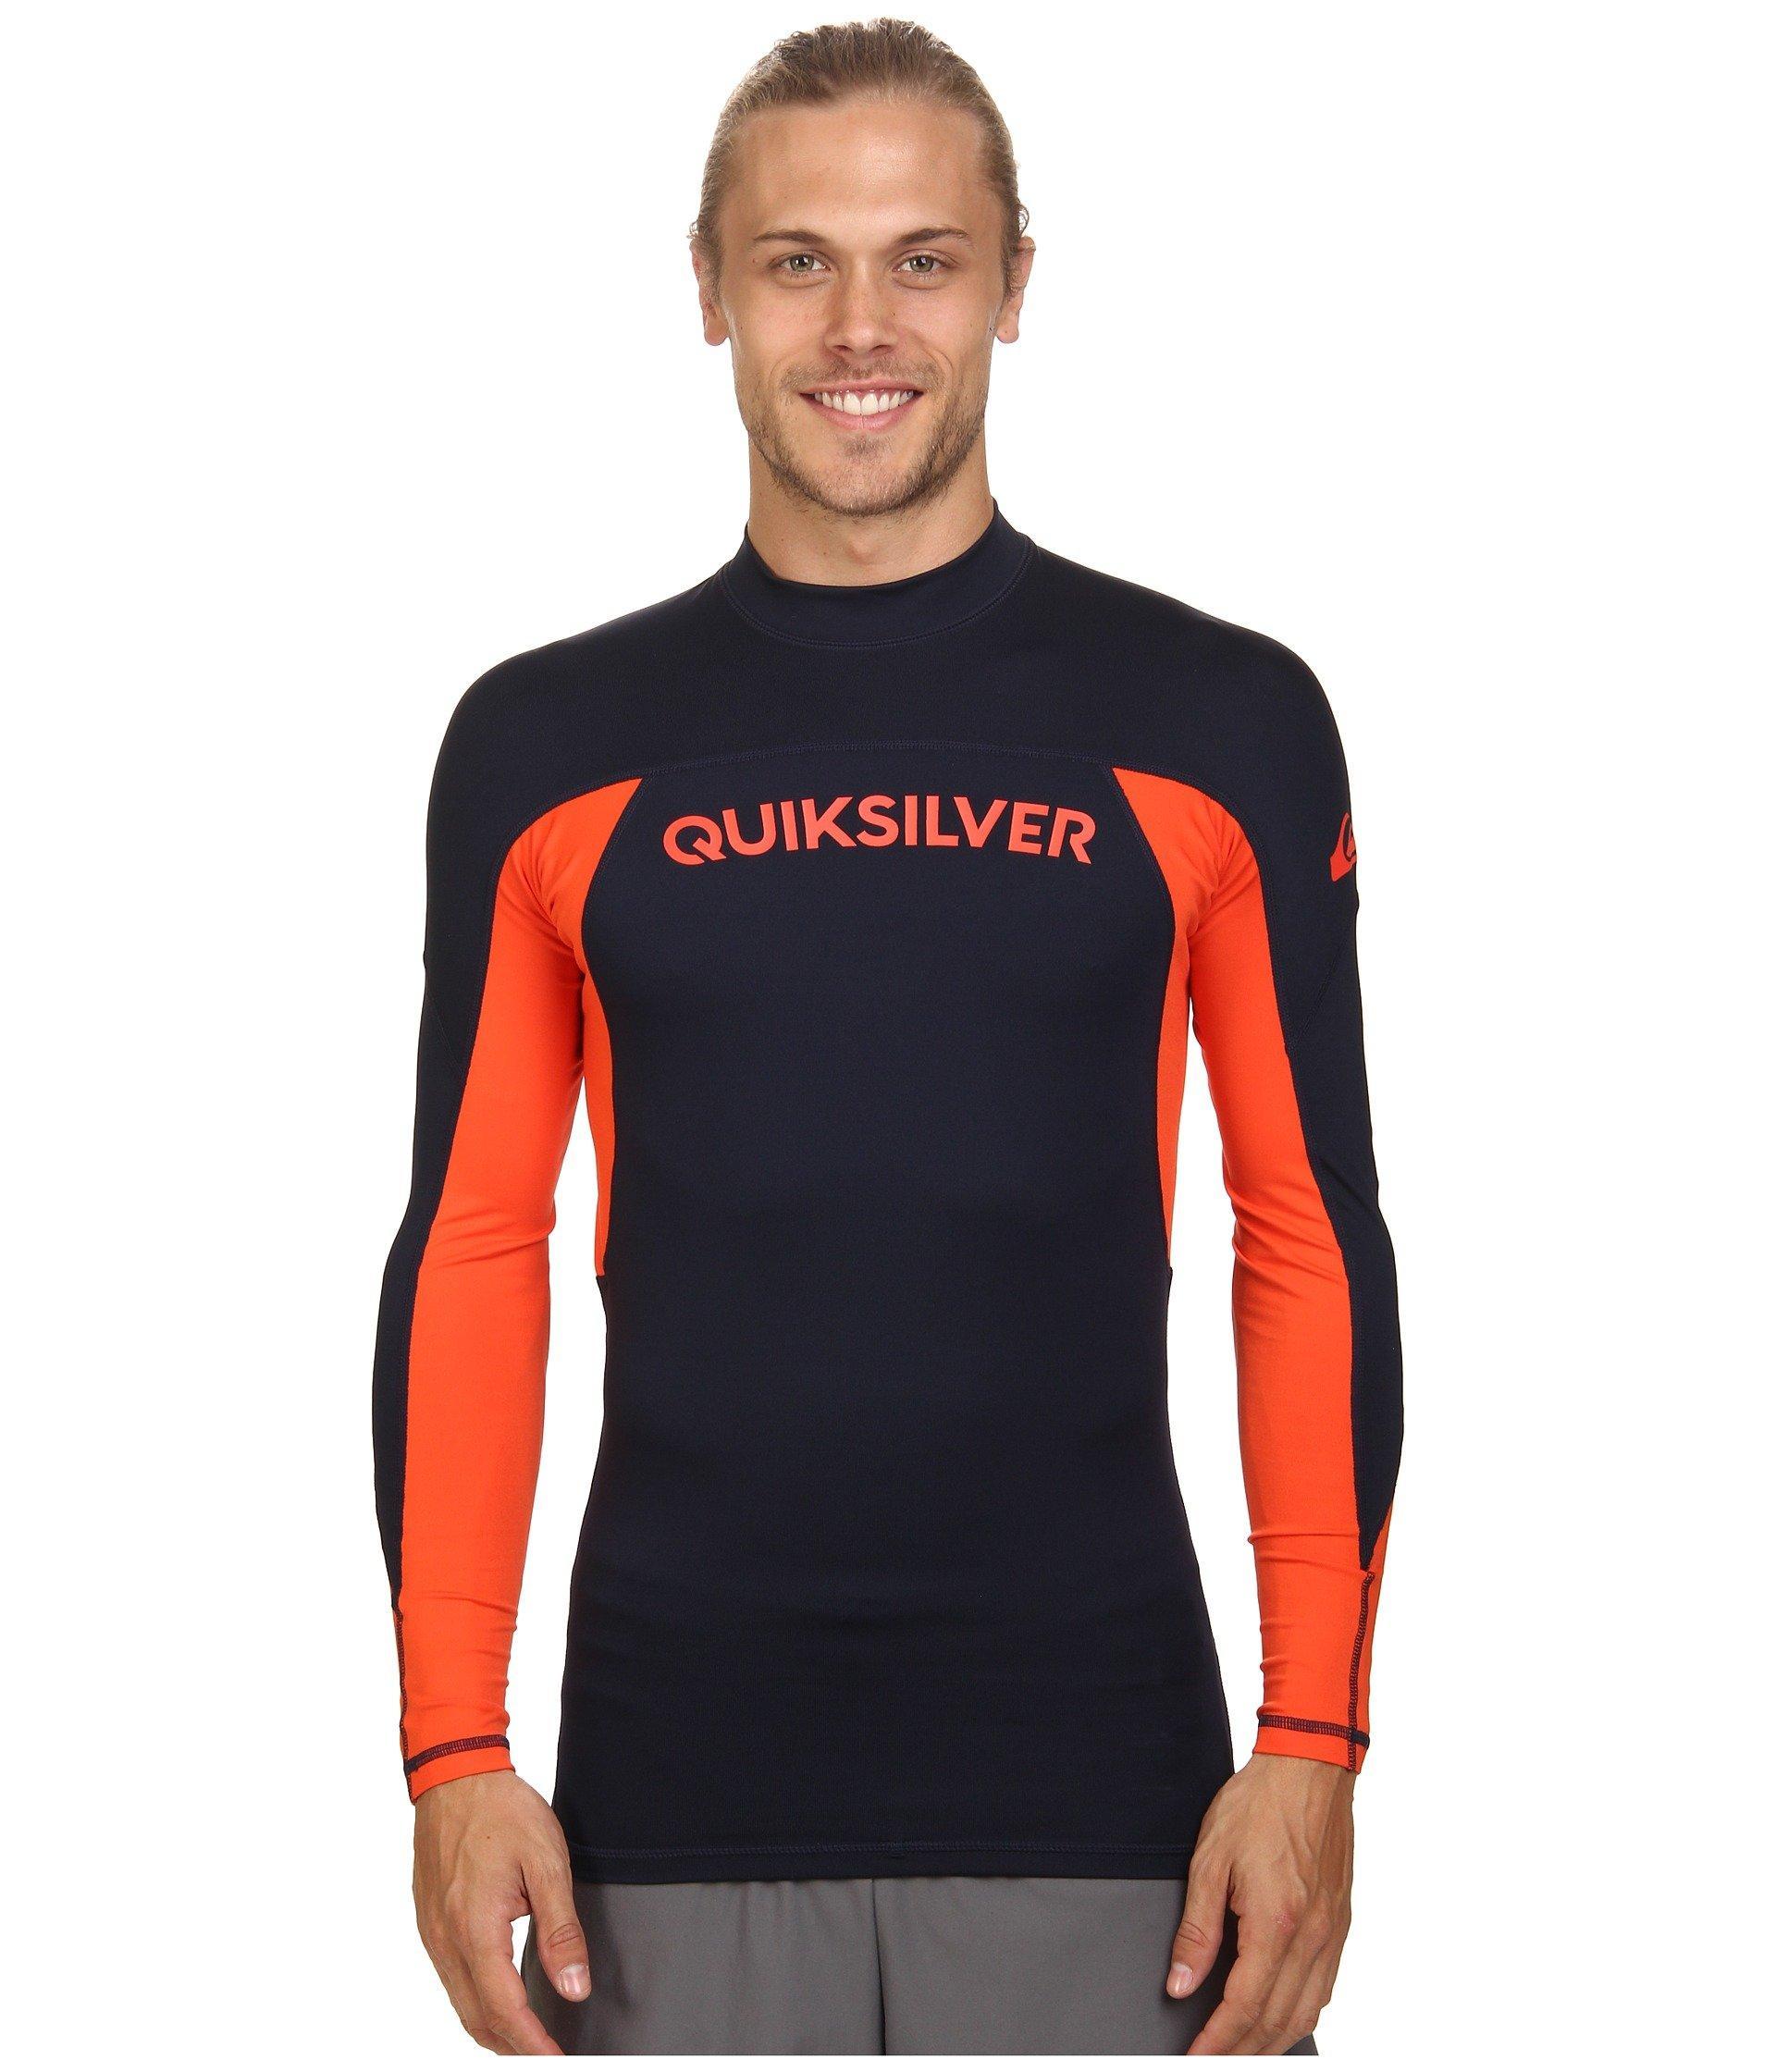 553b499b23 Quiksilver Performer Long Sleeve Rashguard Surf Tee In Navy Blazer/Mandarin  Red